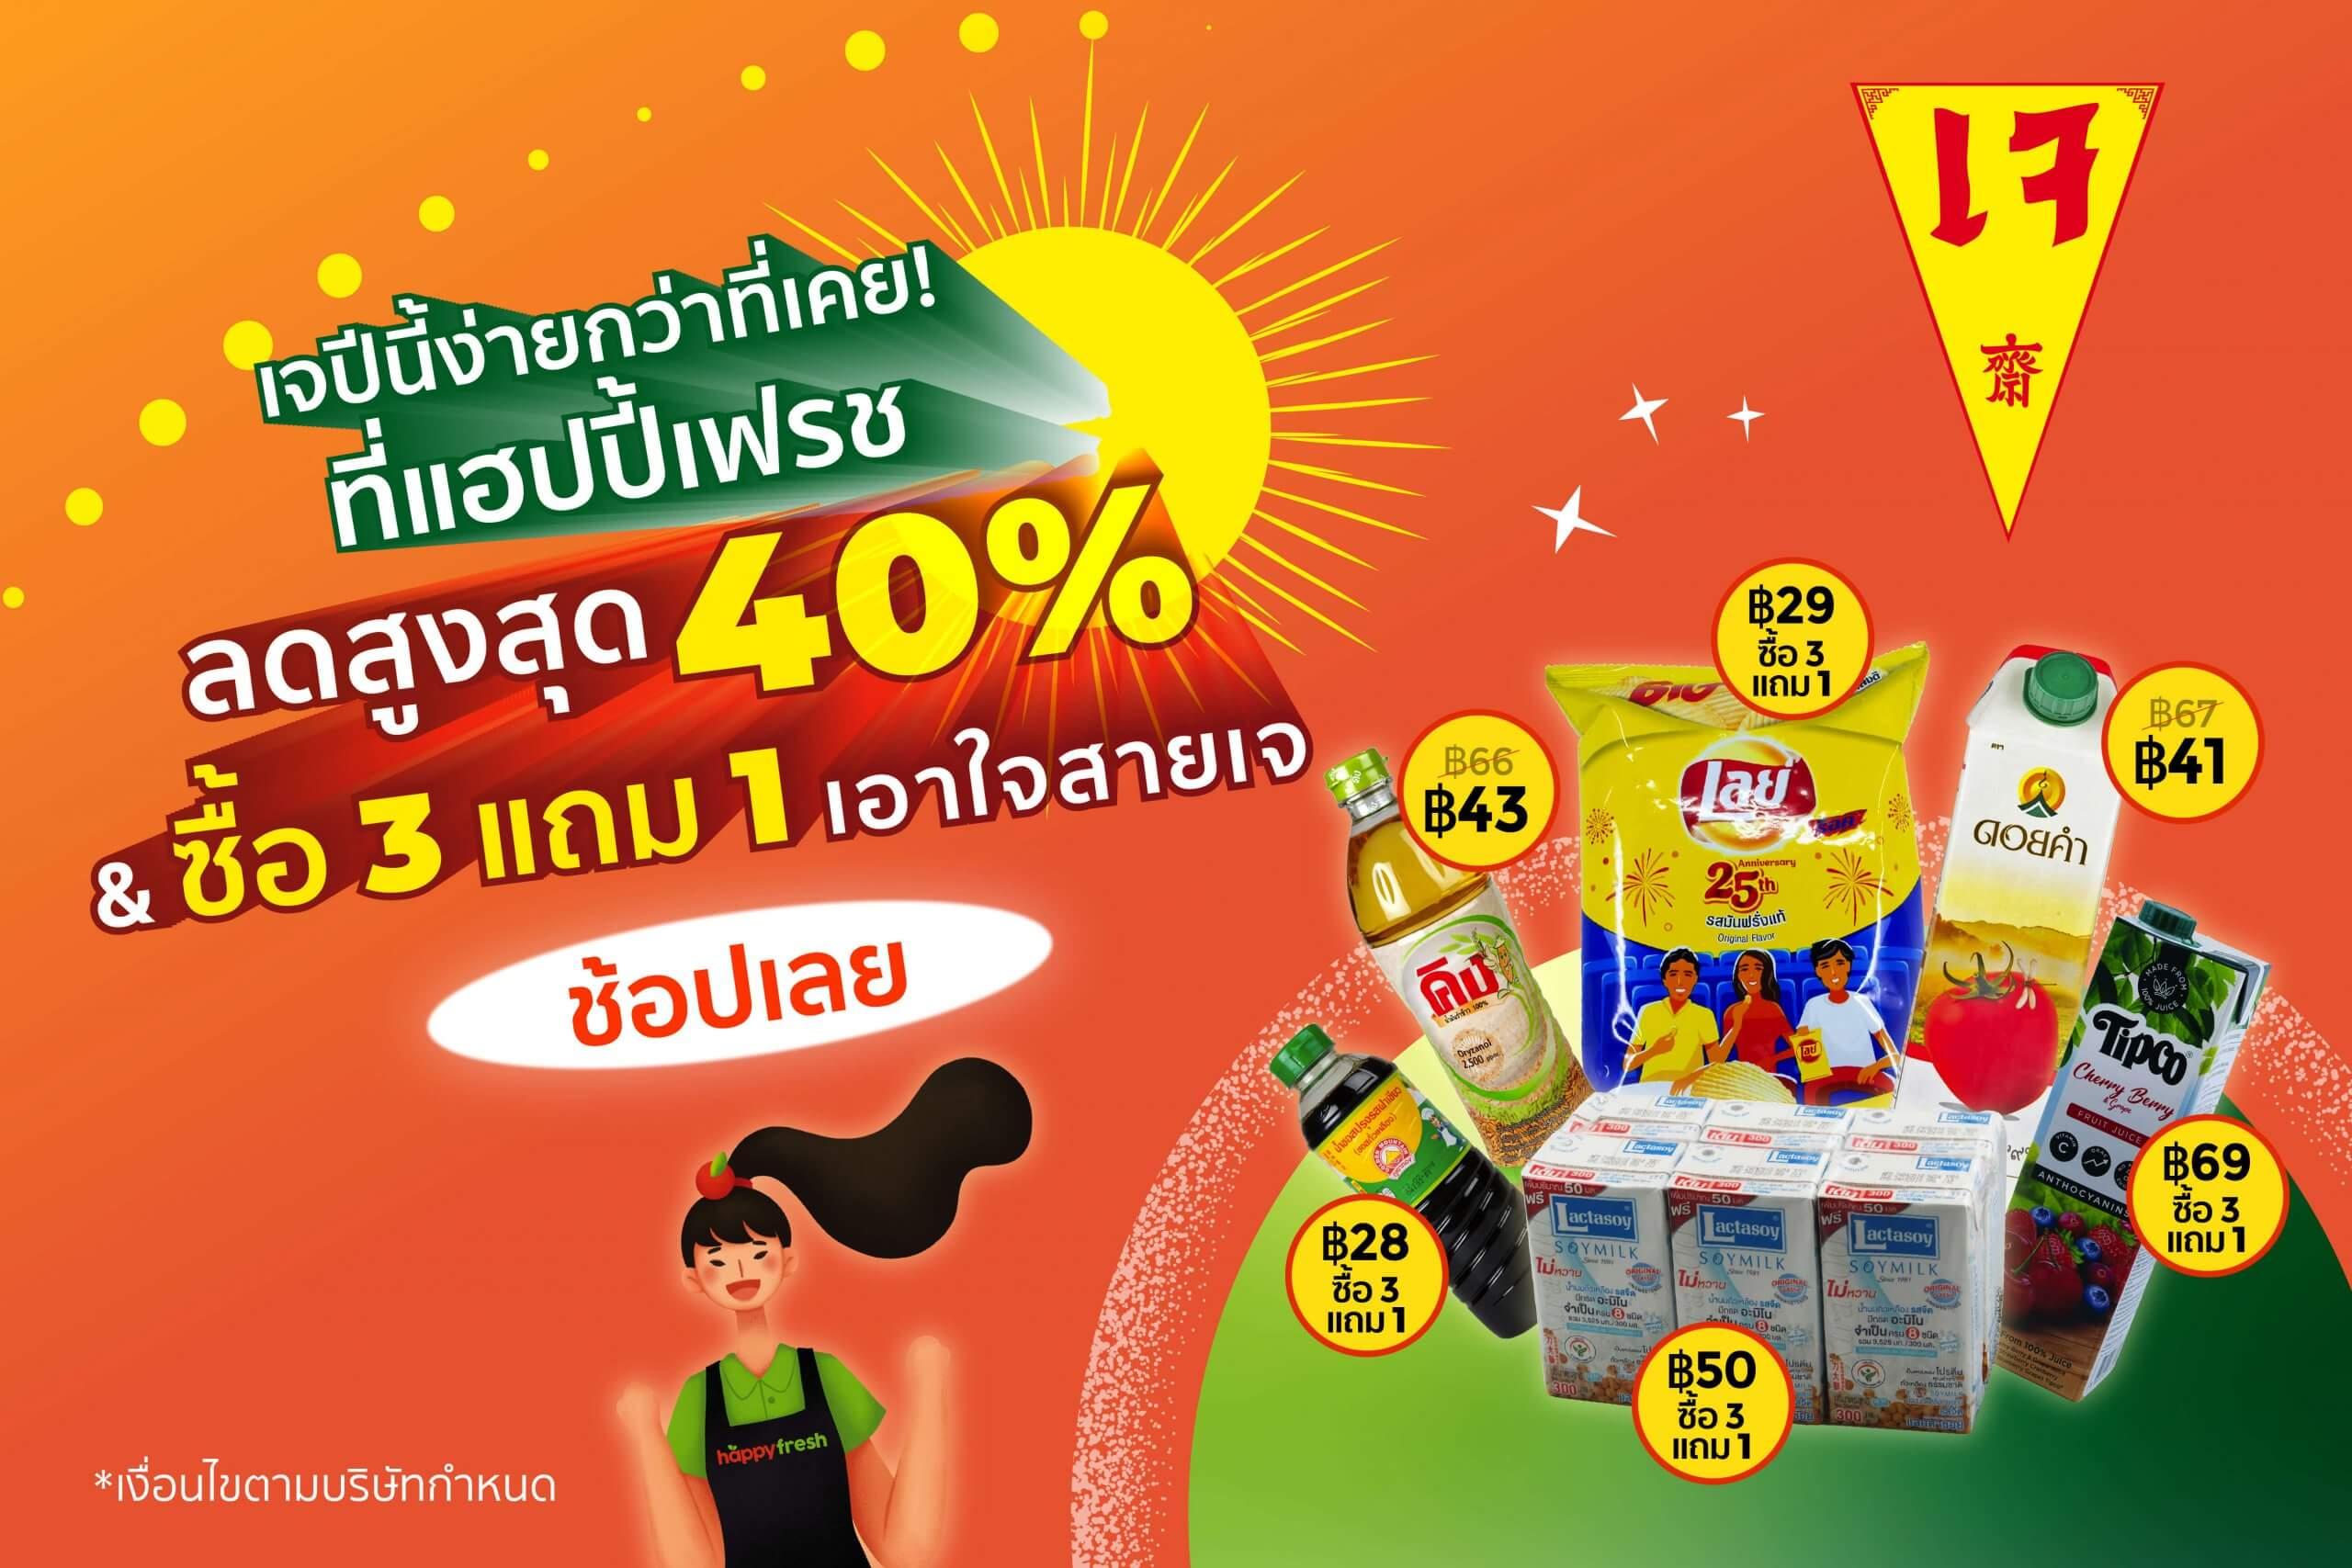 Homepage_Banner_Vegetarian_Festival_Product_Discount_Tesco_Lotus_Big_C